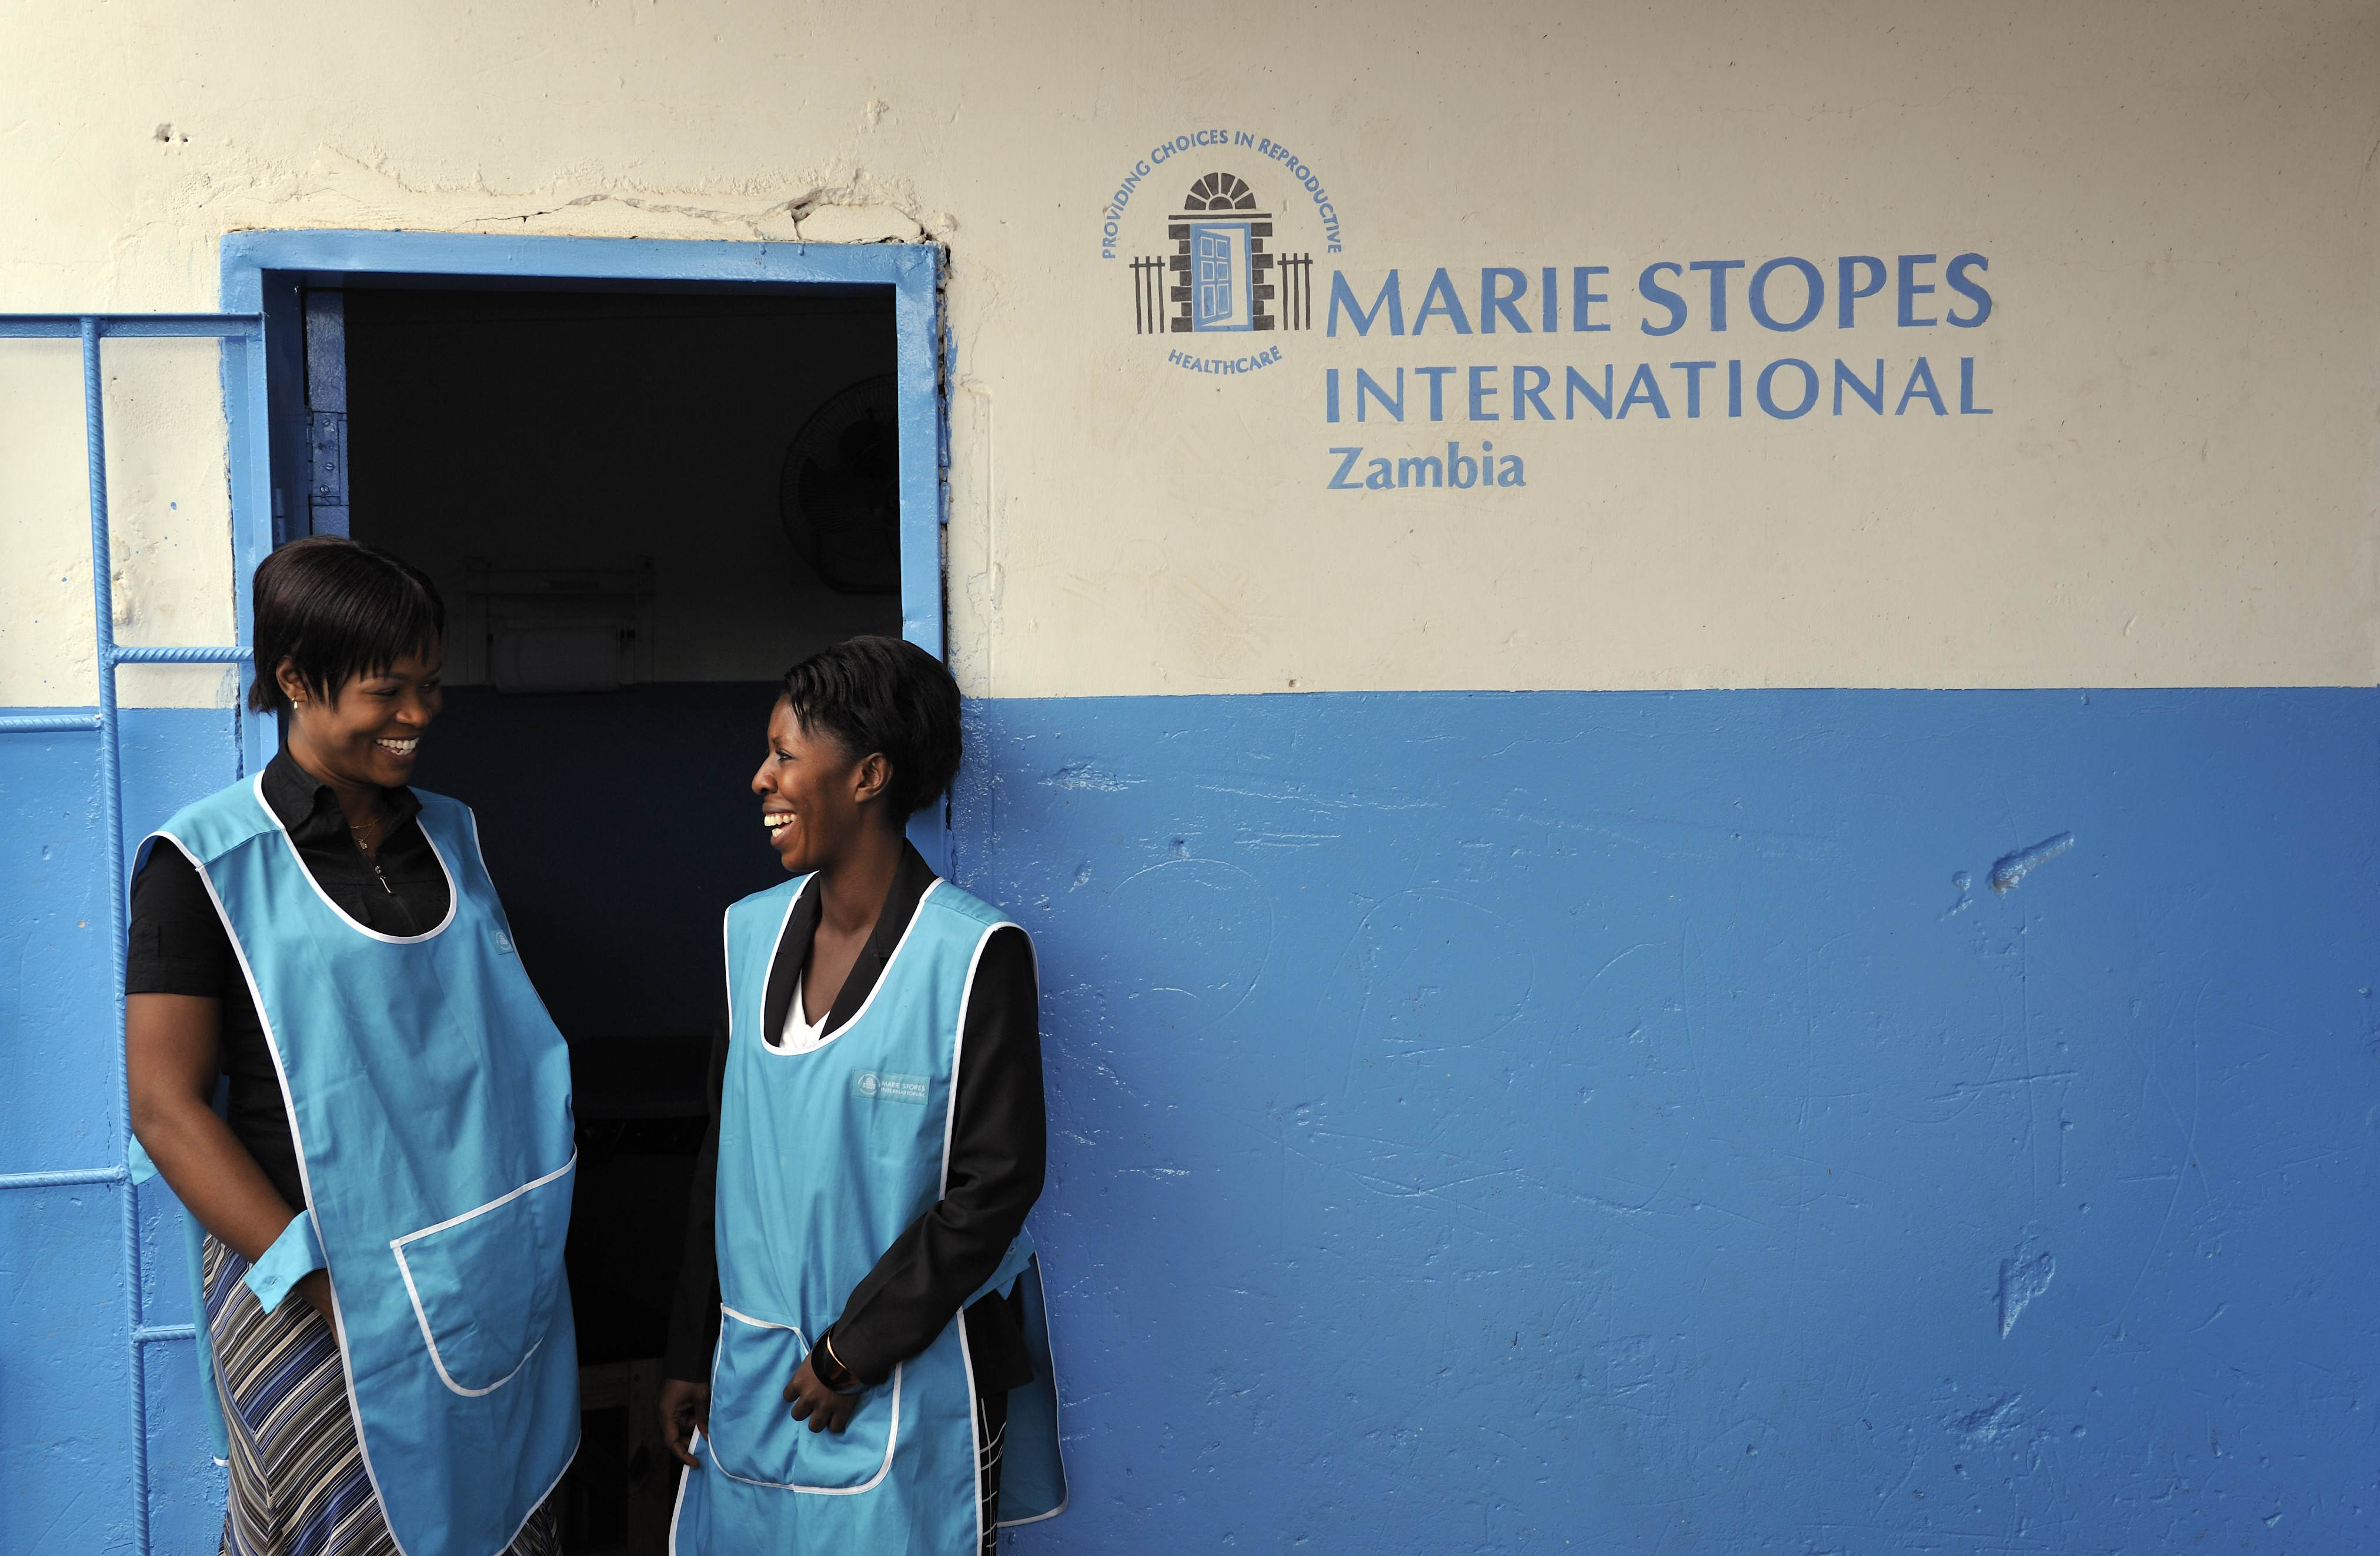 Sede de Marie Stopes Internacional en Zambia